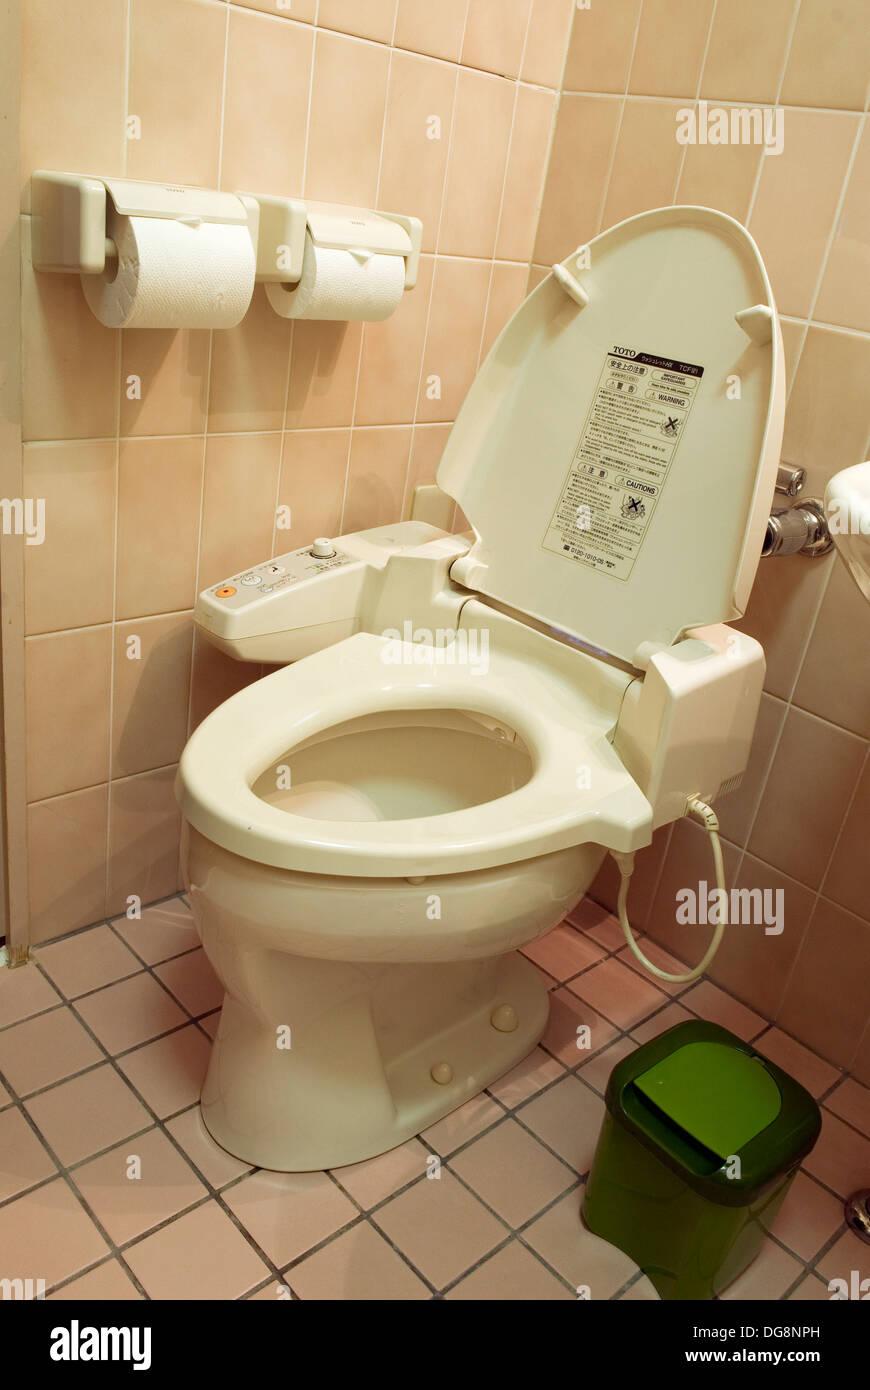 Japanese Toilet Stock Photos & Japanese Toilet Stock Images - Alamy